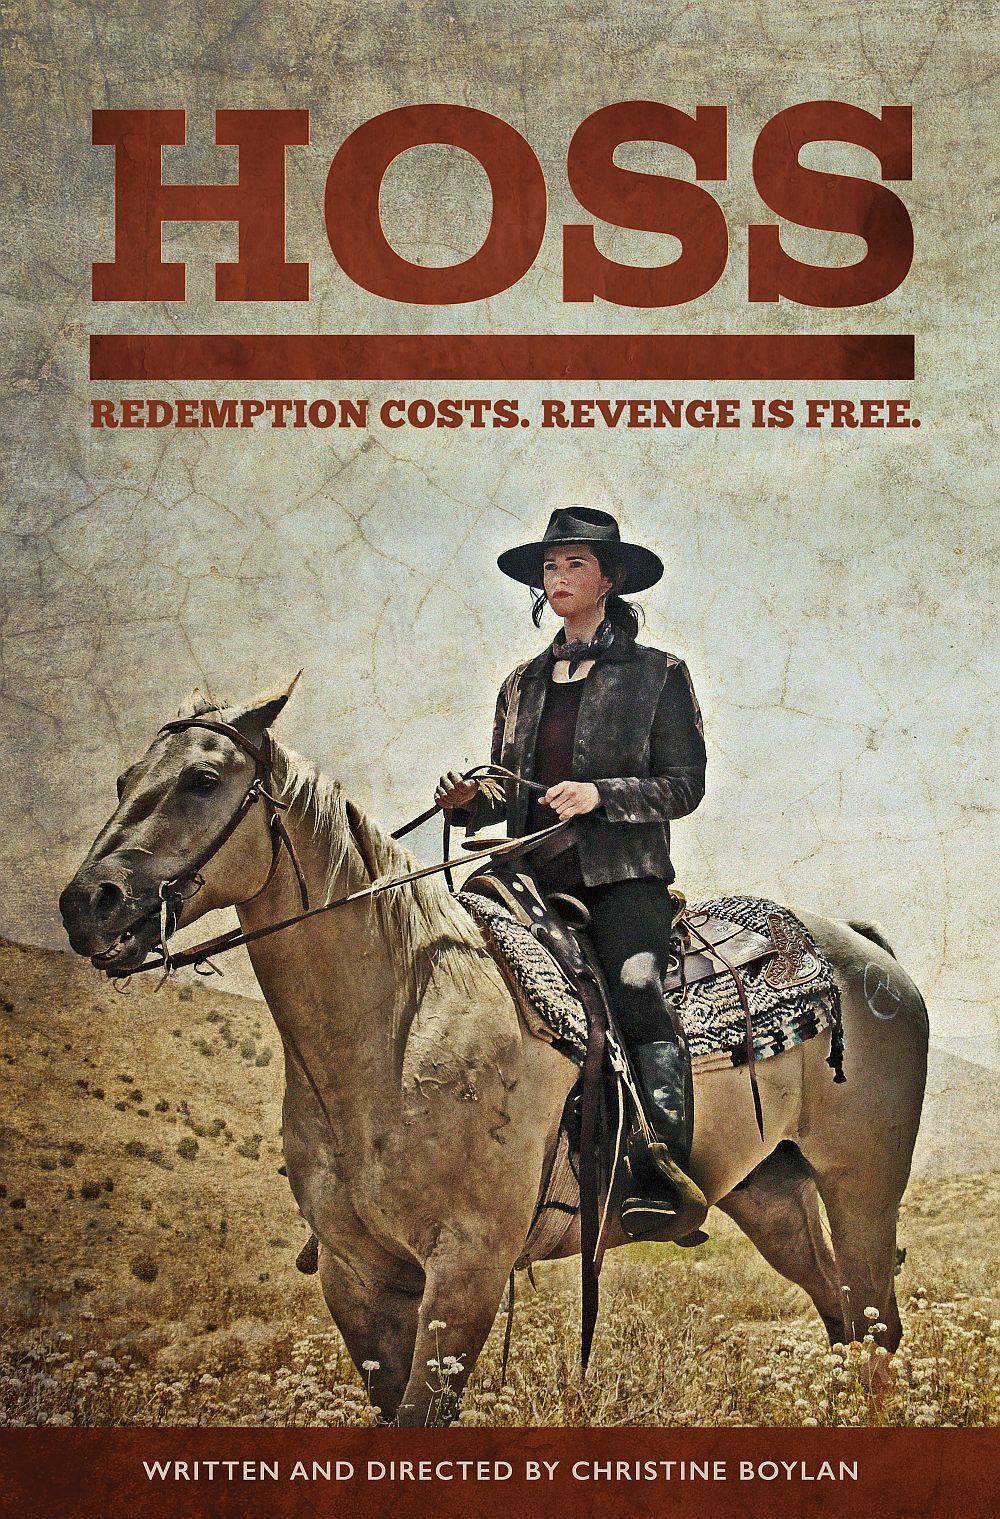 HOSS directed by Christine Boylan